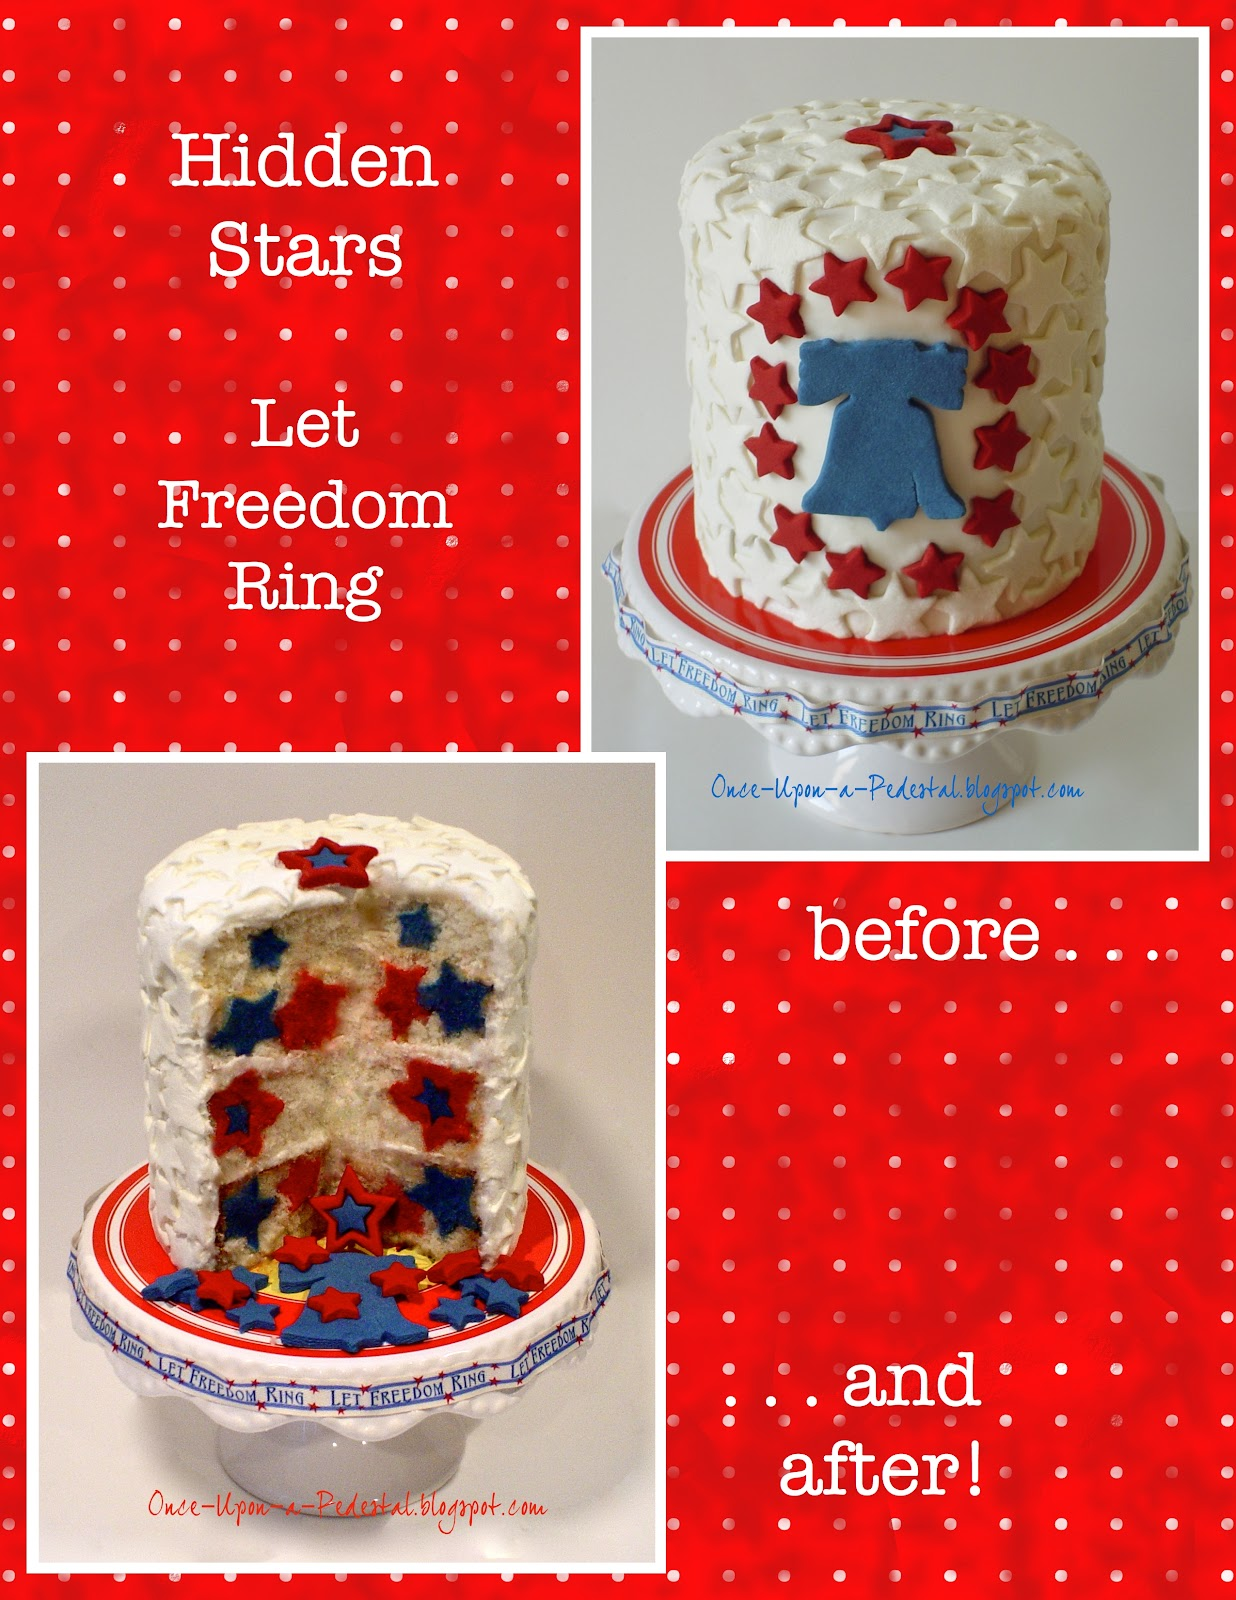 Once Upon A Pedestal: Surprise Inside Cake - Hidden Stars ...